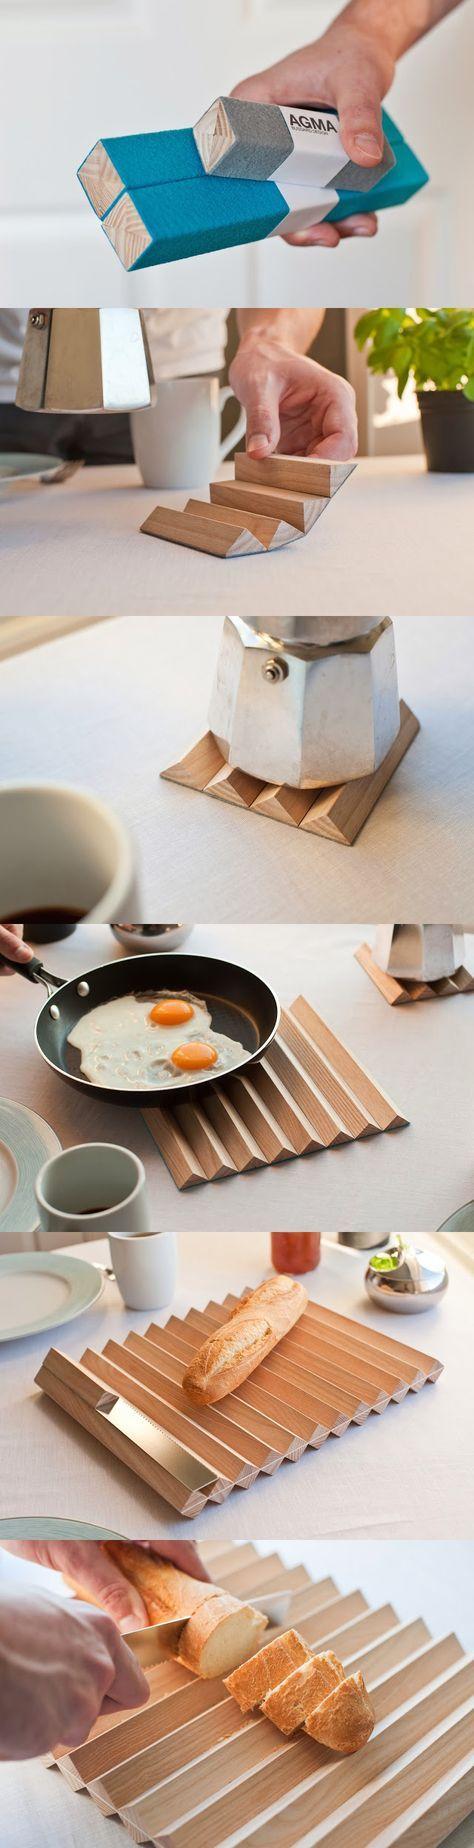 best great design images on pinterest product design cool